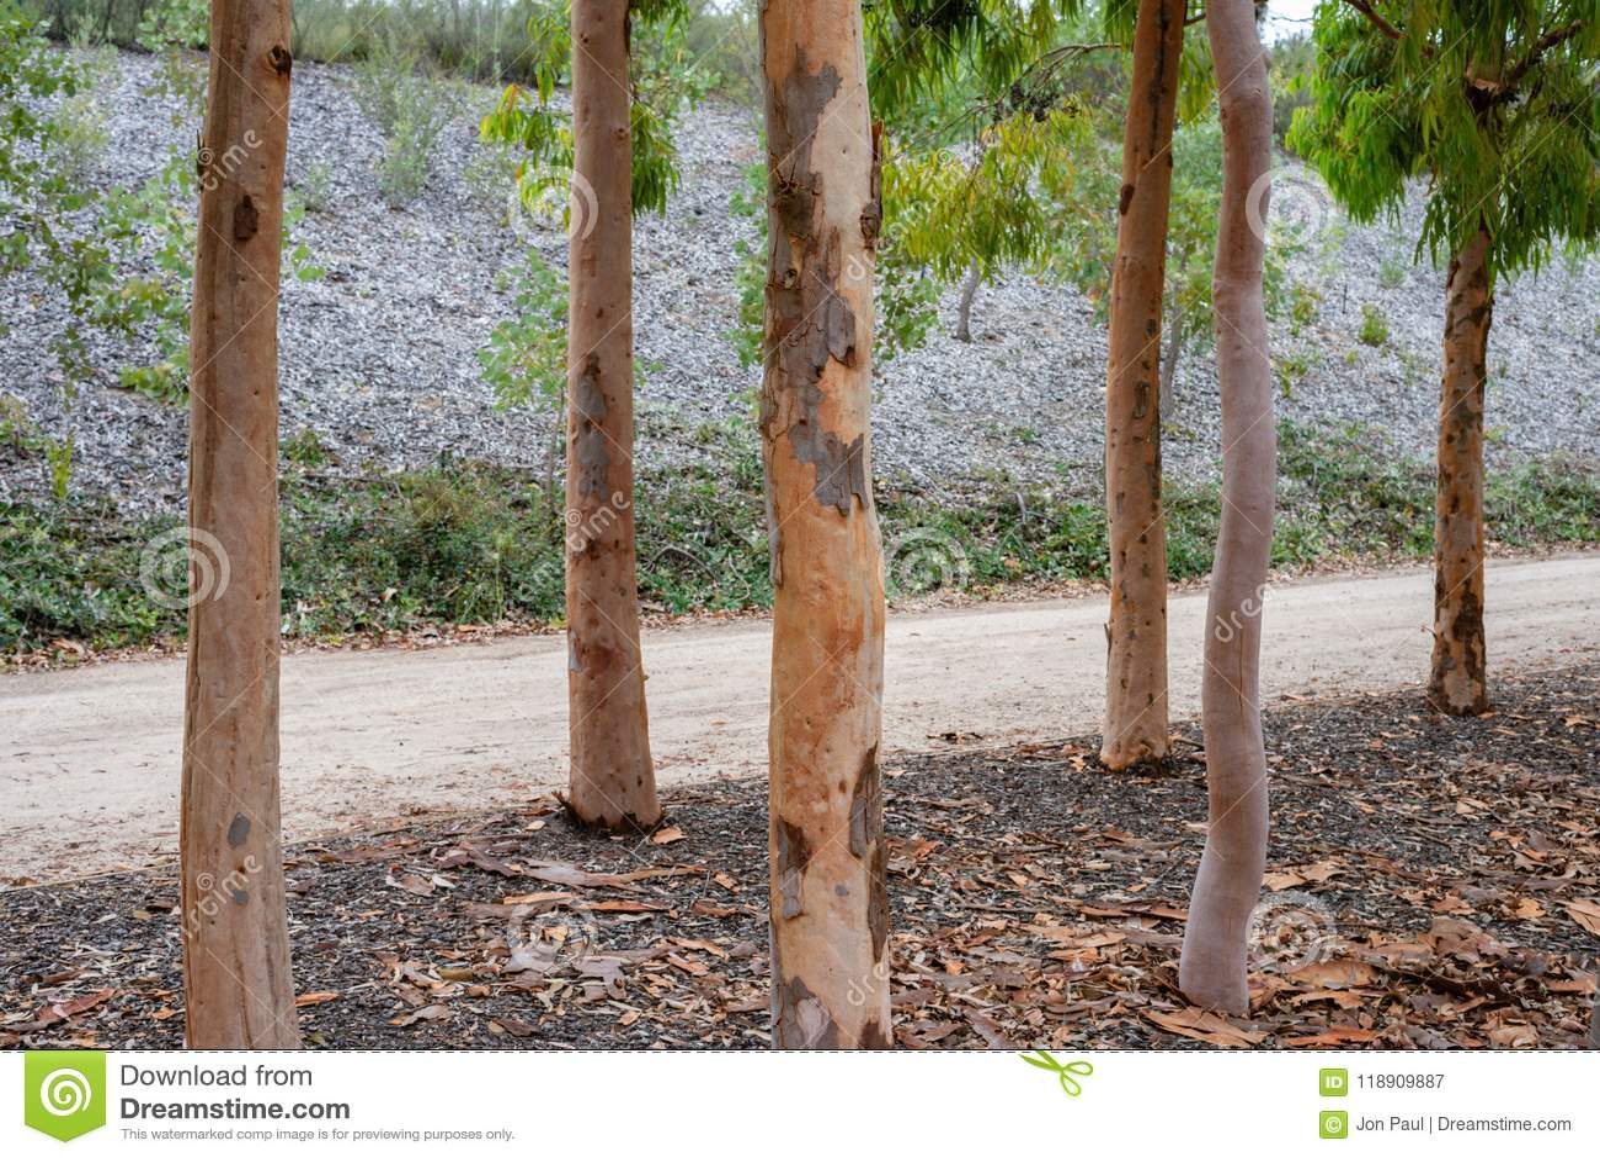 native australian silver birch trees in the royal botanic gardens victoria stock image